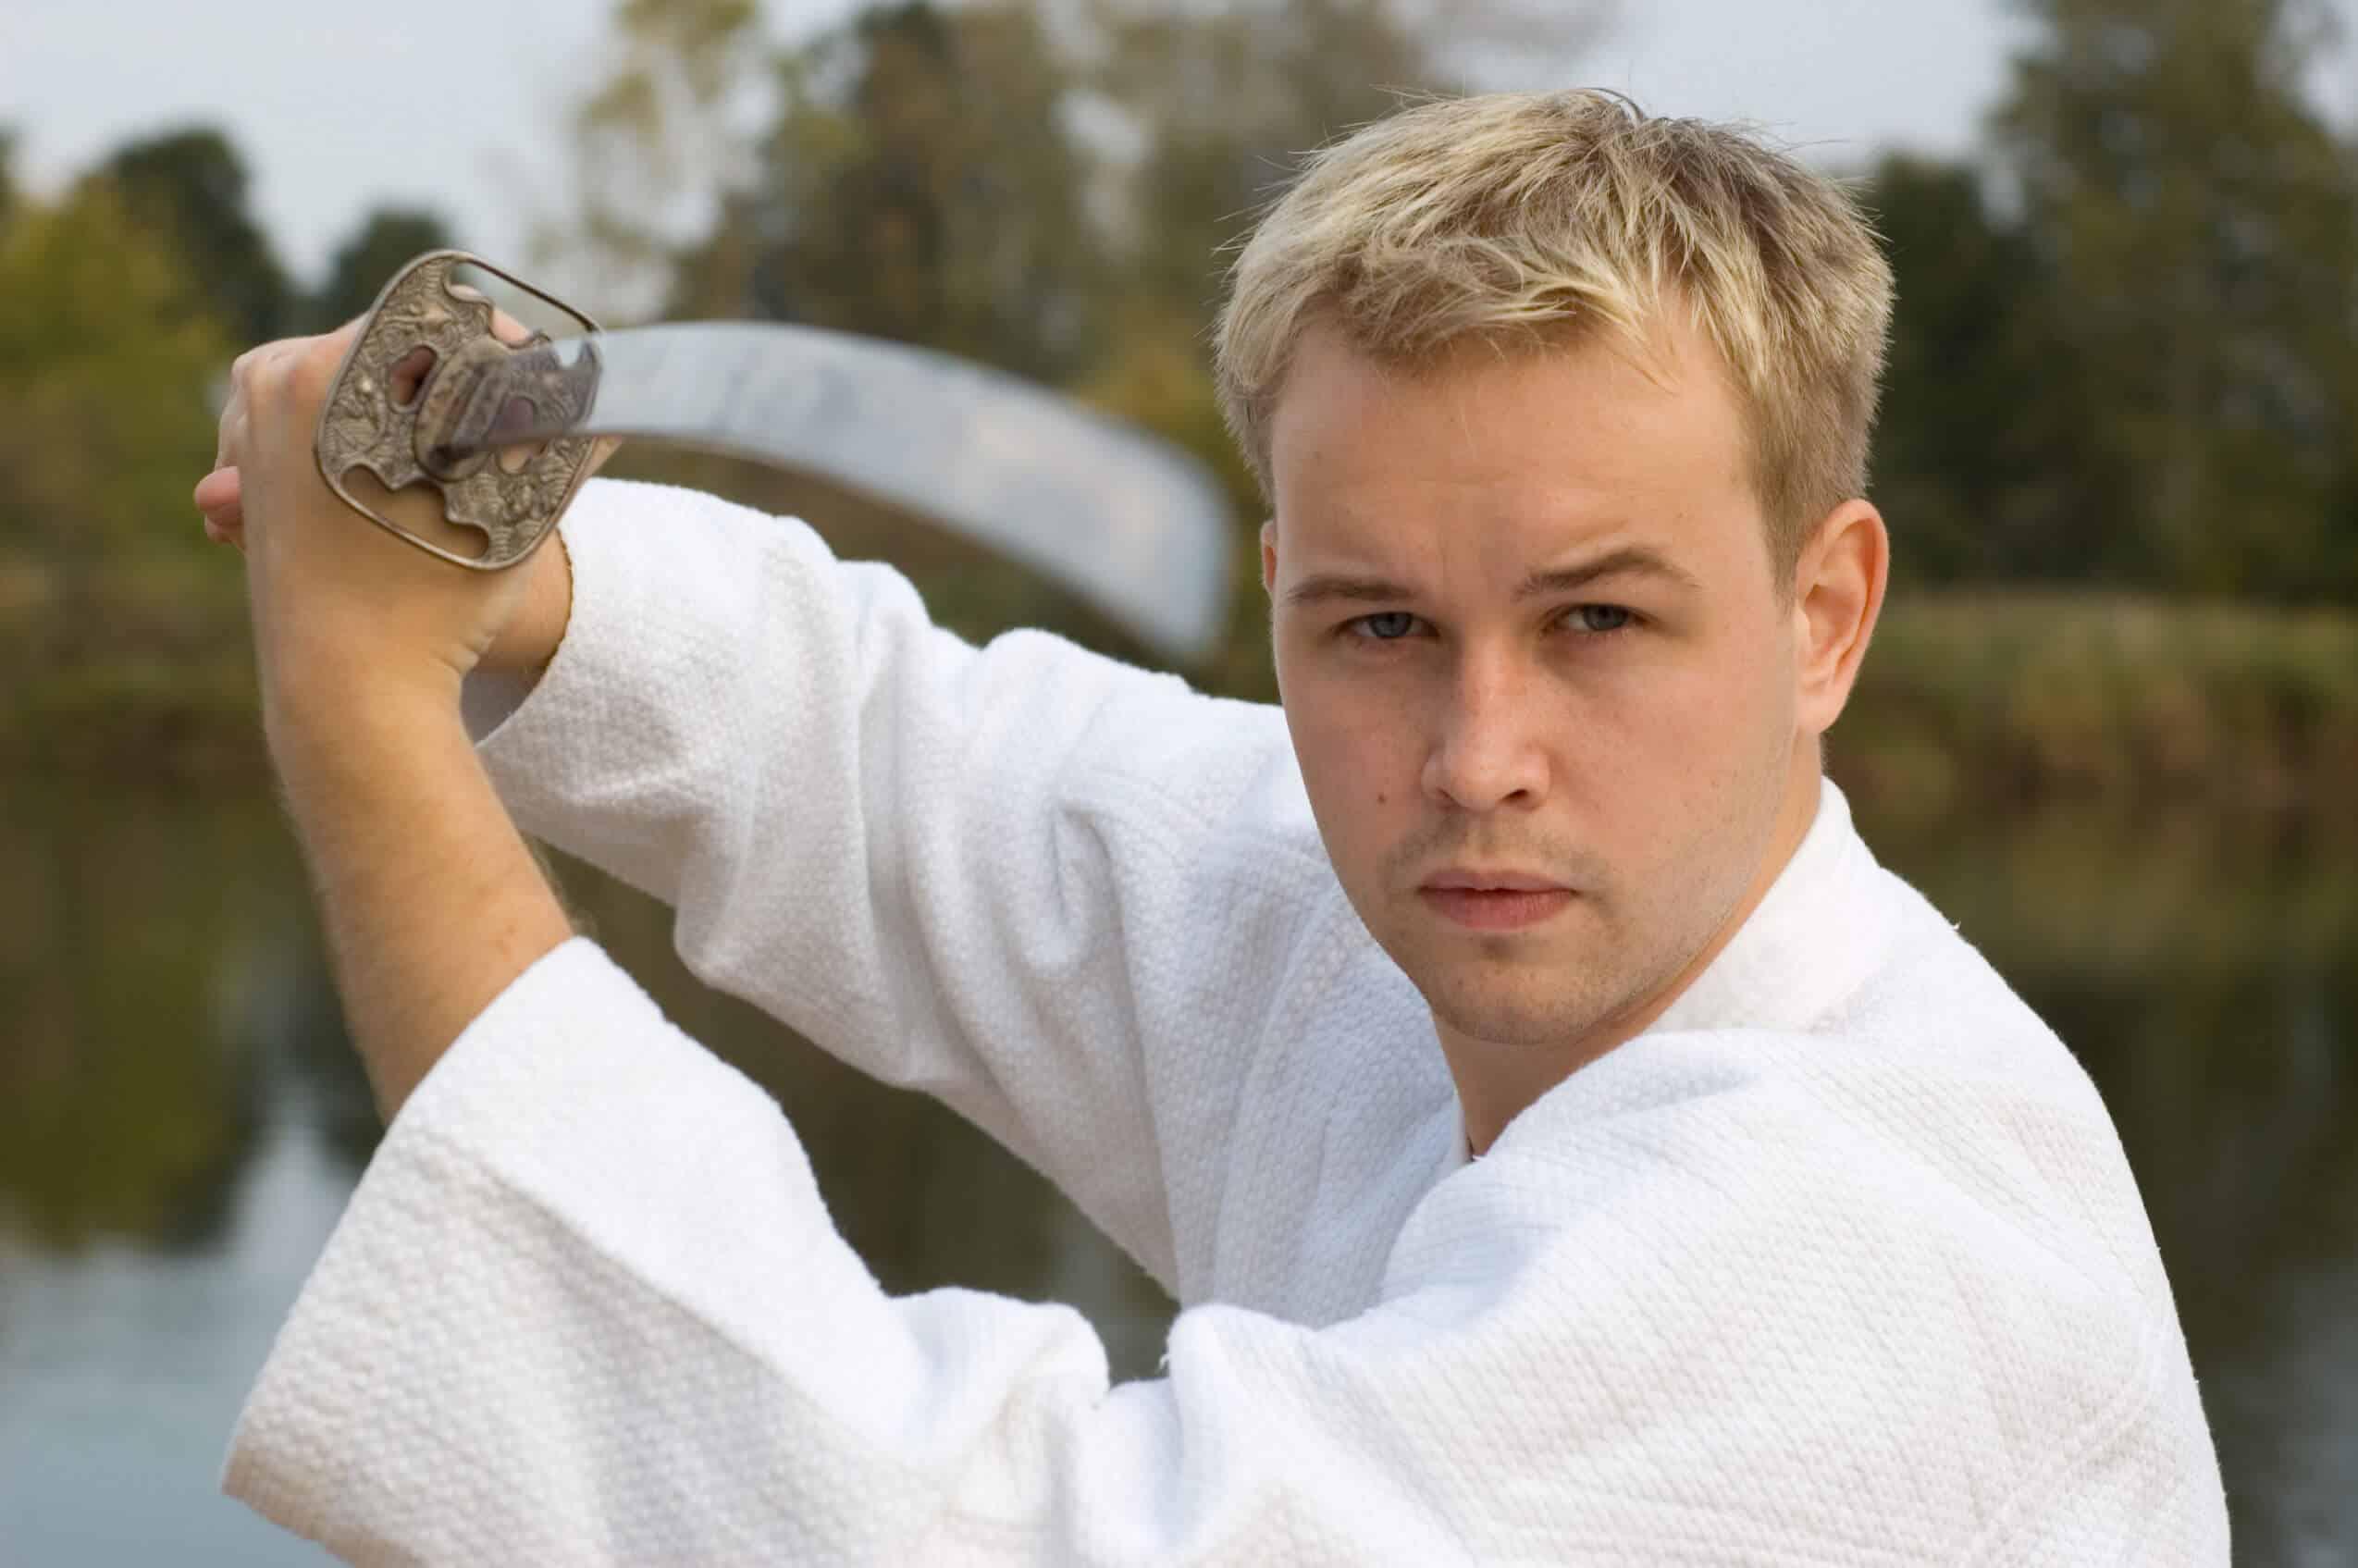 Martial Arts Lessons for Adults in Vista CA - Samurai Sword Posing Blog